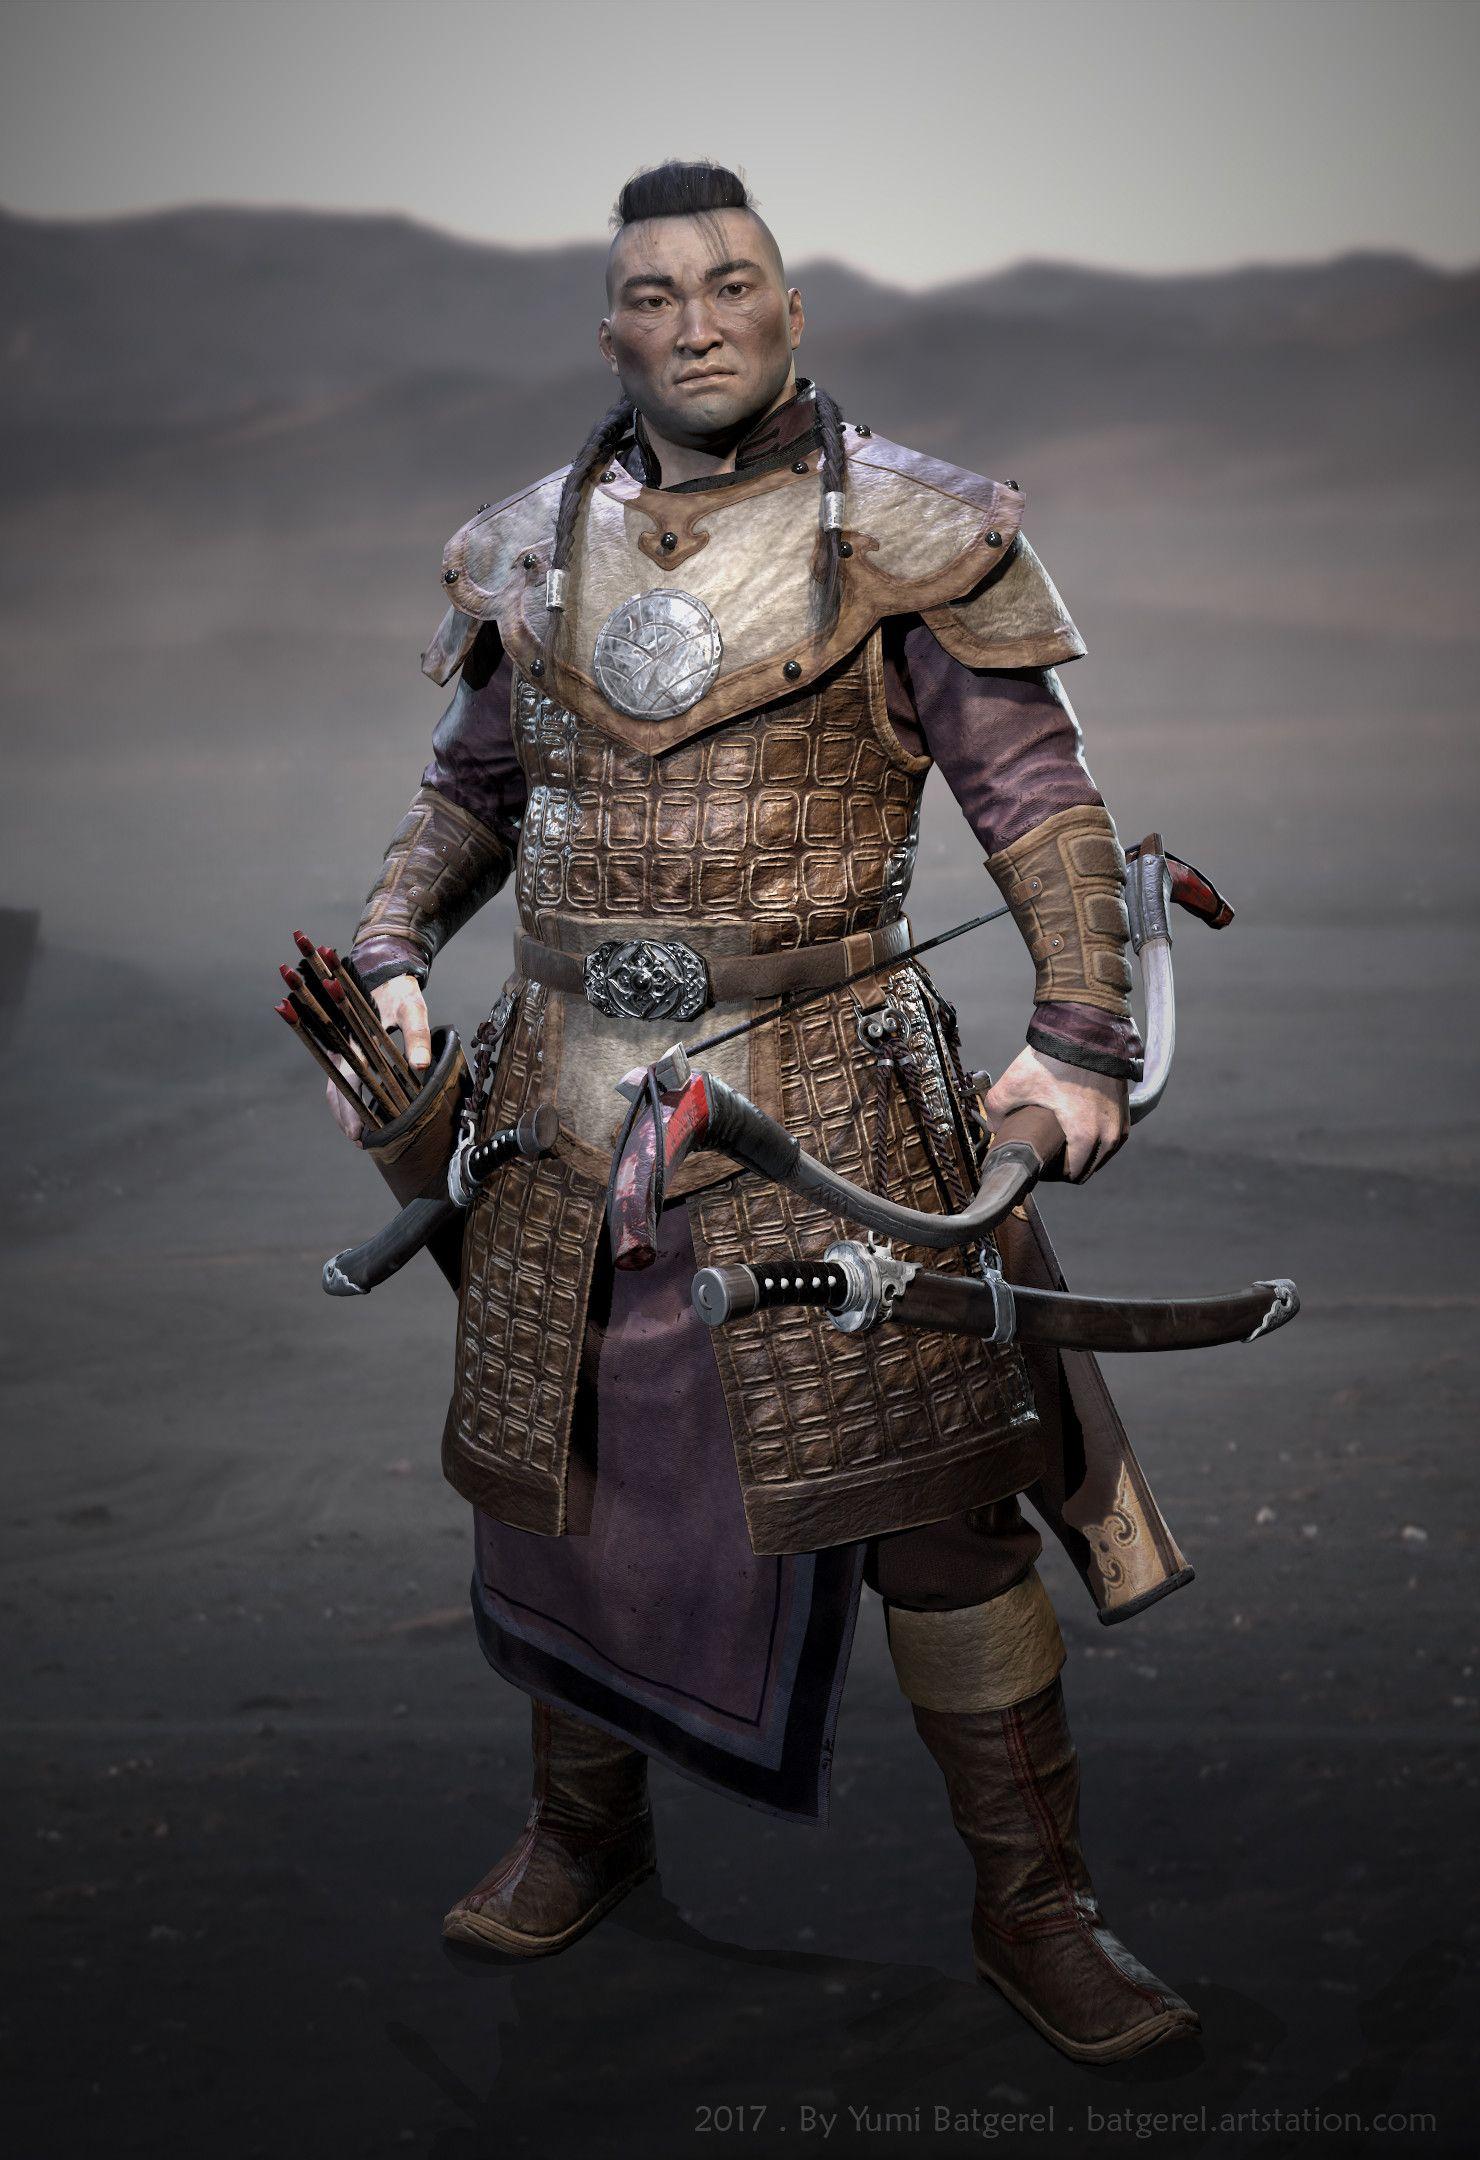 ArtStation - Mongolian Warrior, Yumi Batgerel | 3D ...